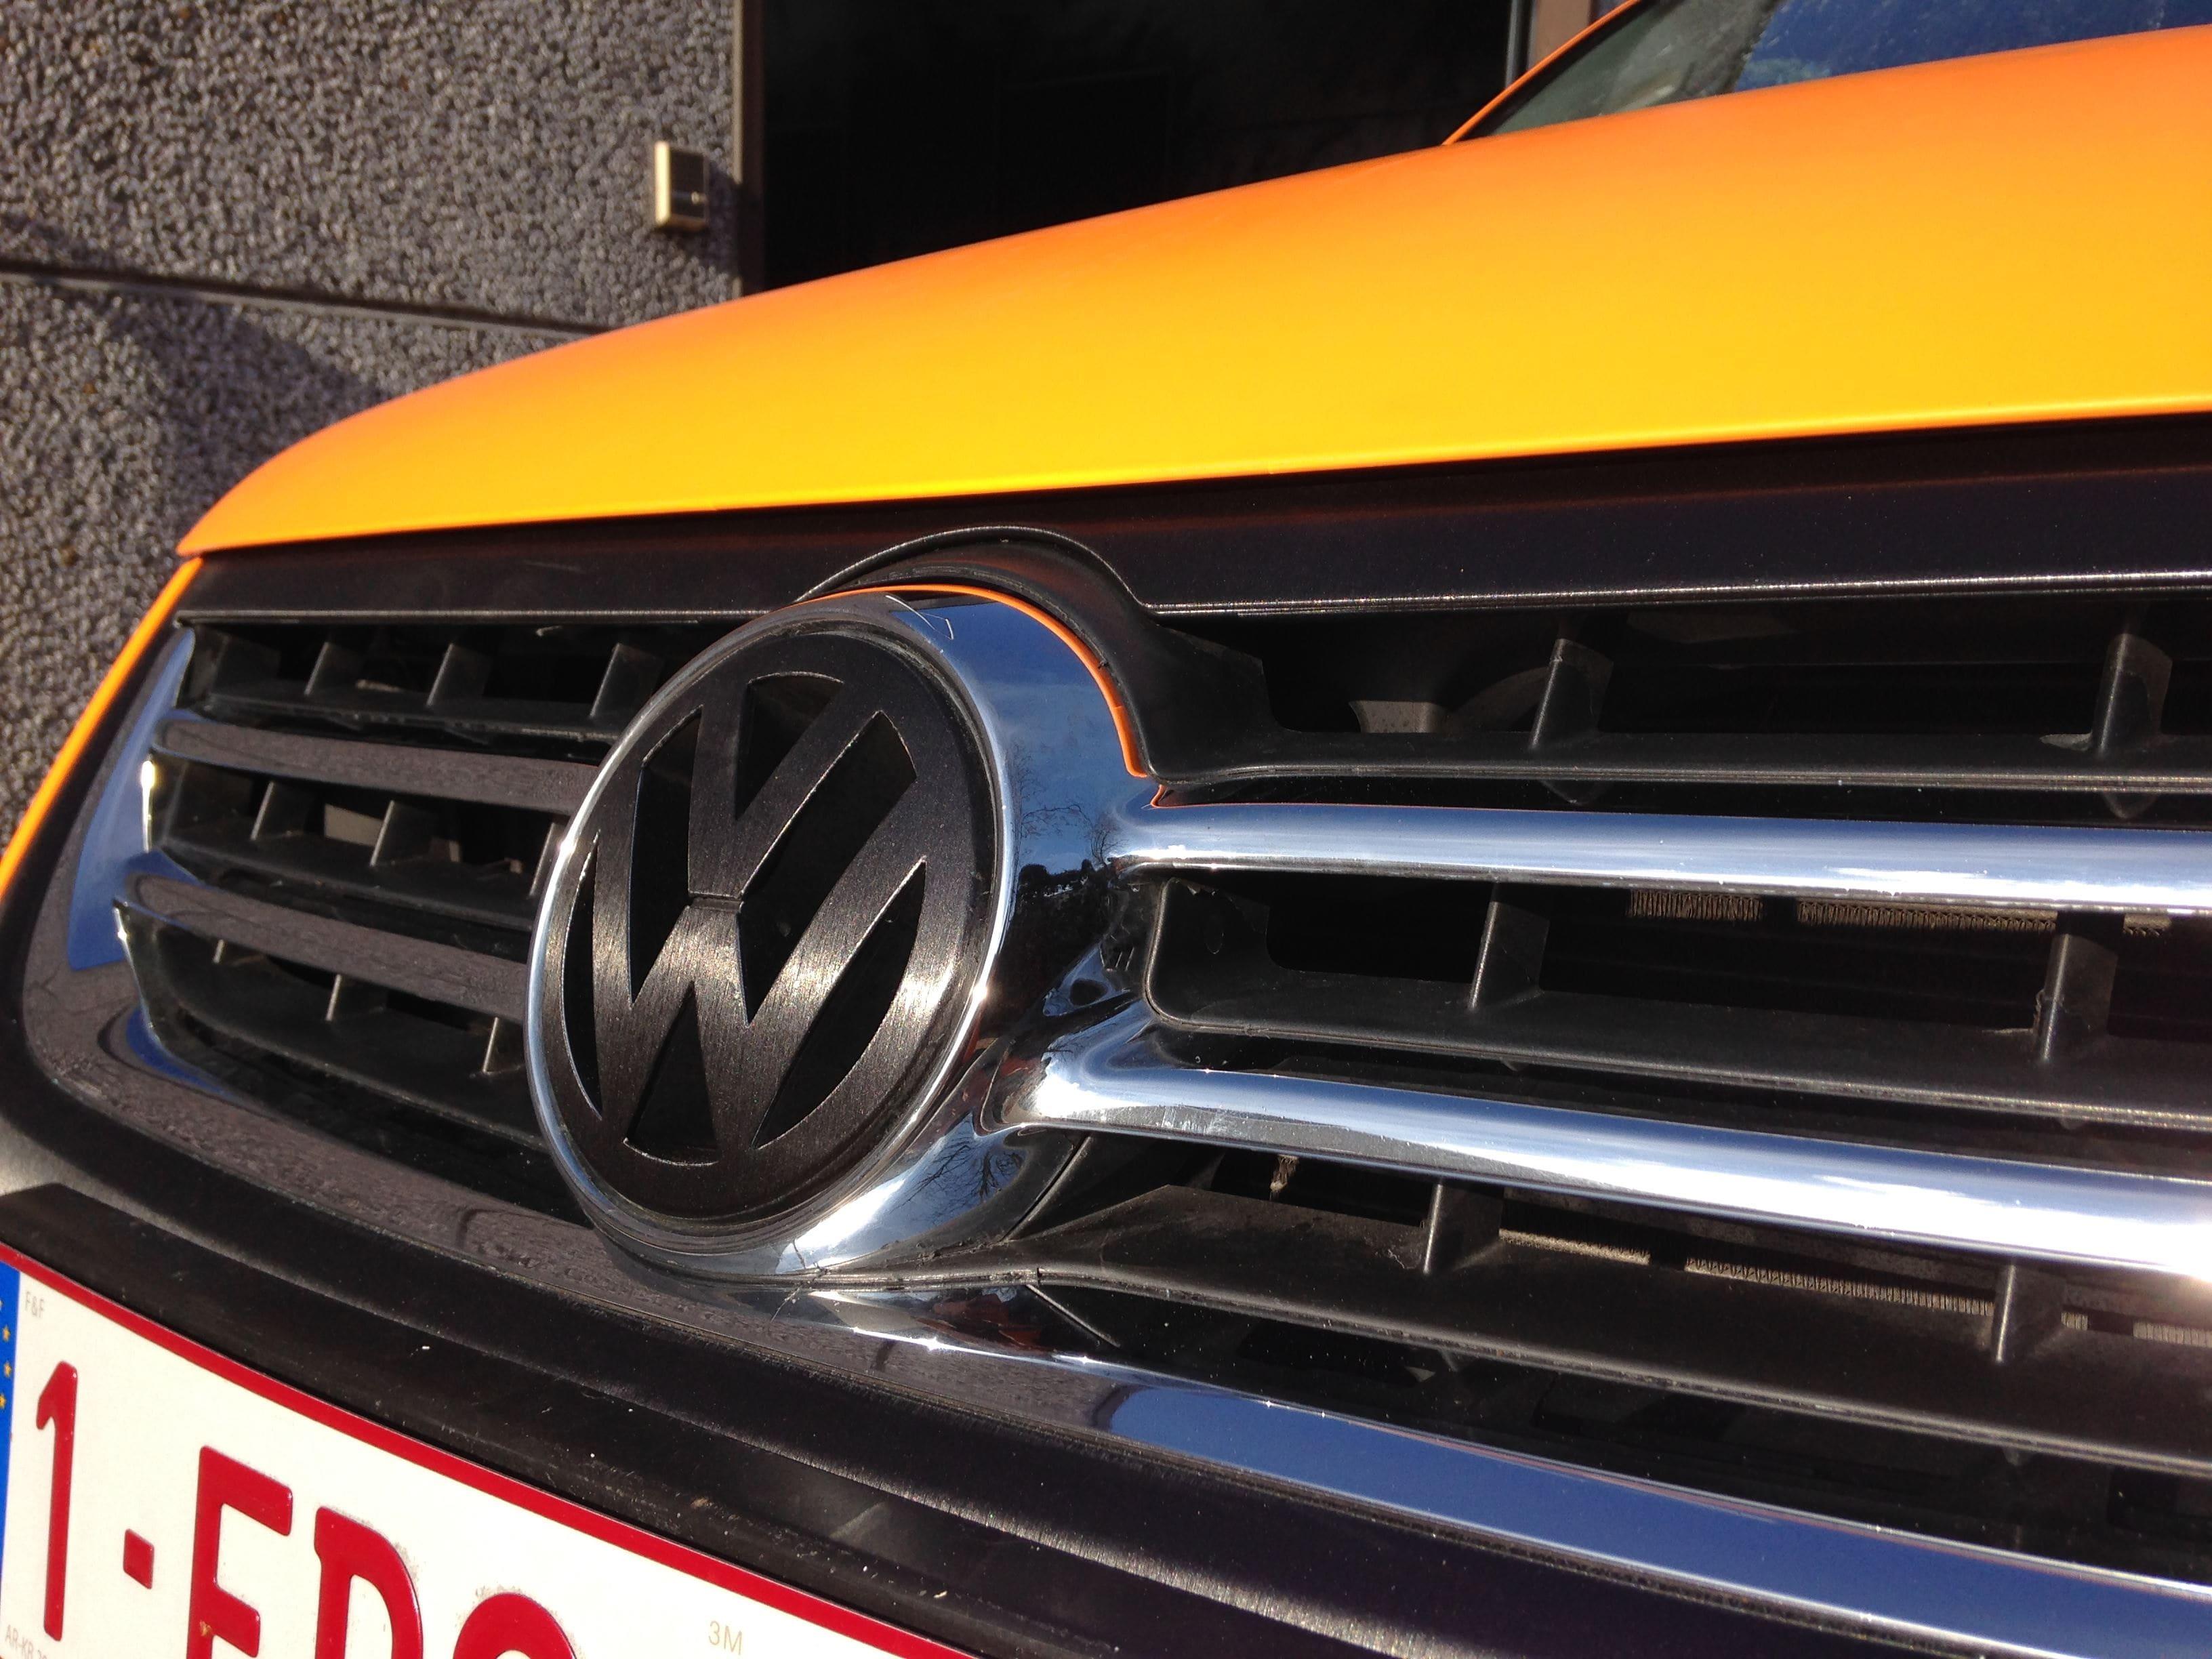 Volkswagen Touareg met Mat Oranje Wrap, Carwrapping door Wrapmyride.nu Foto-nr:7391, ©2020